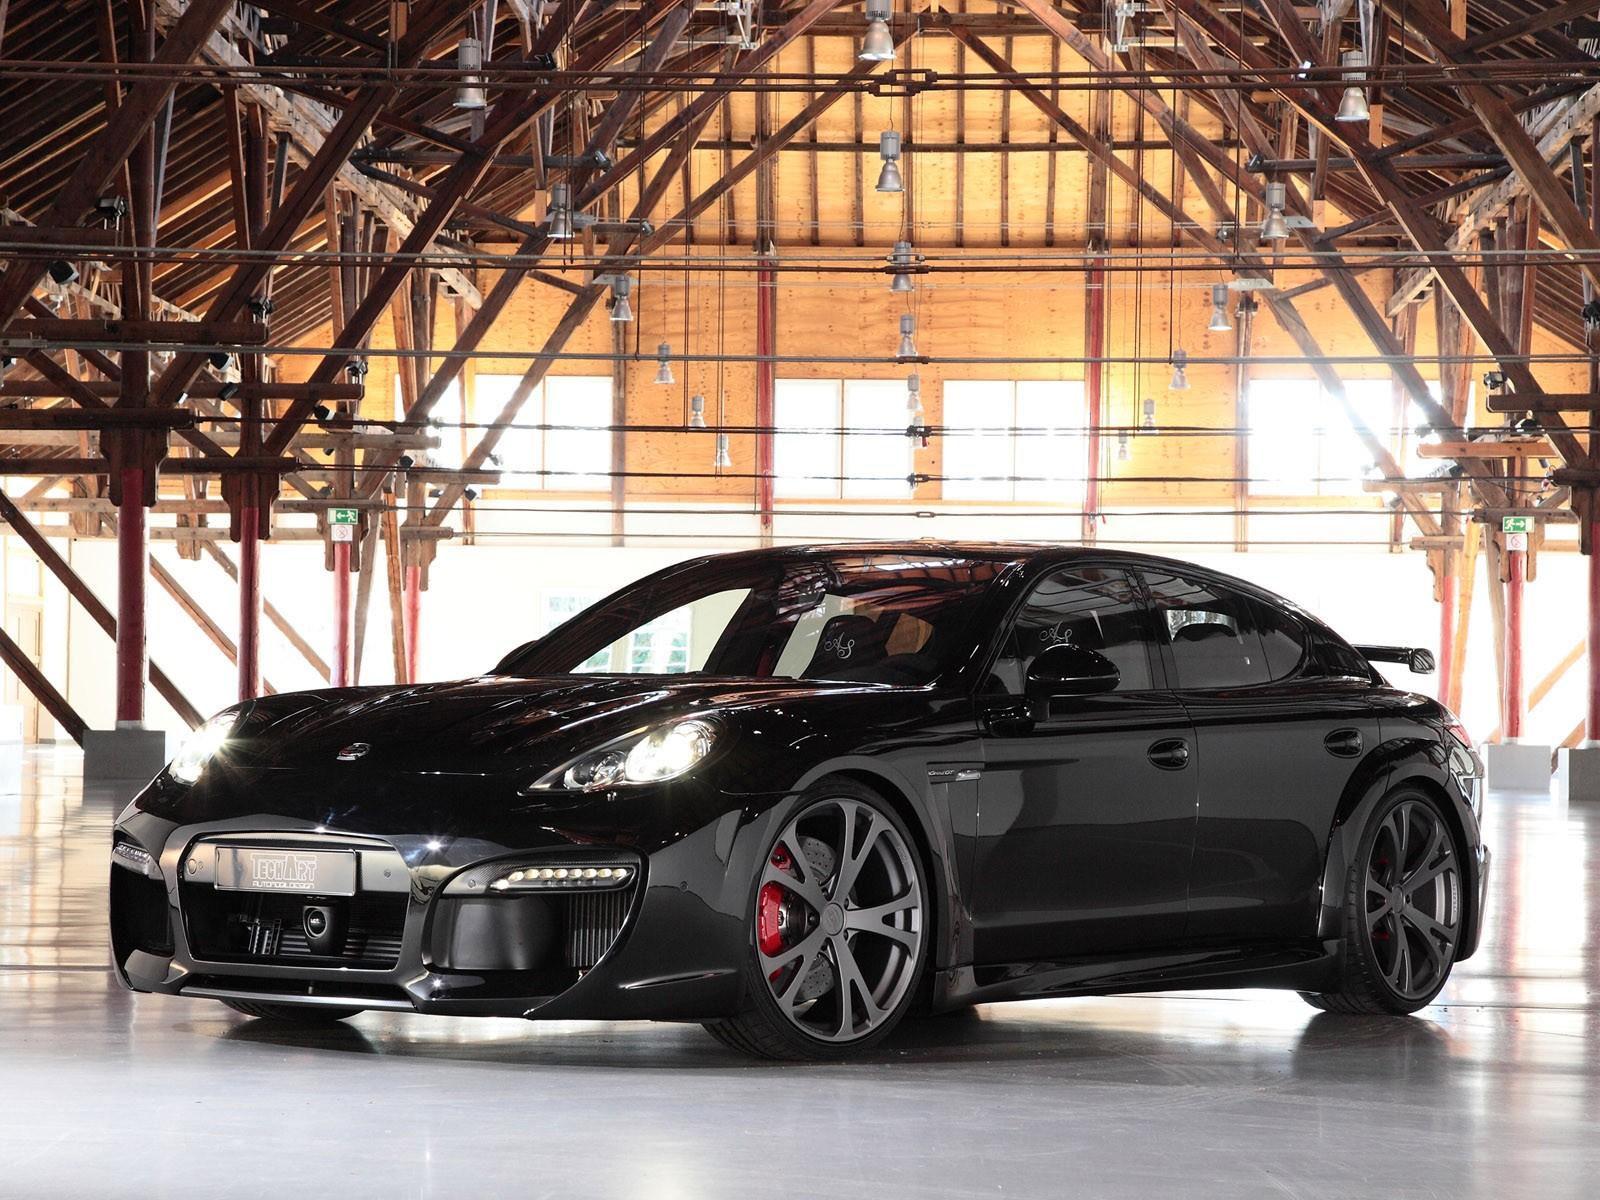 2011 Techart Porsche Panamera Turbo Grand GT